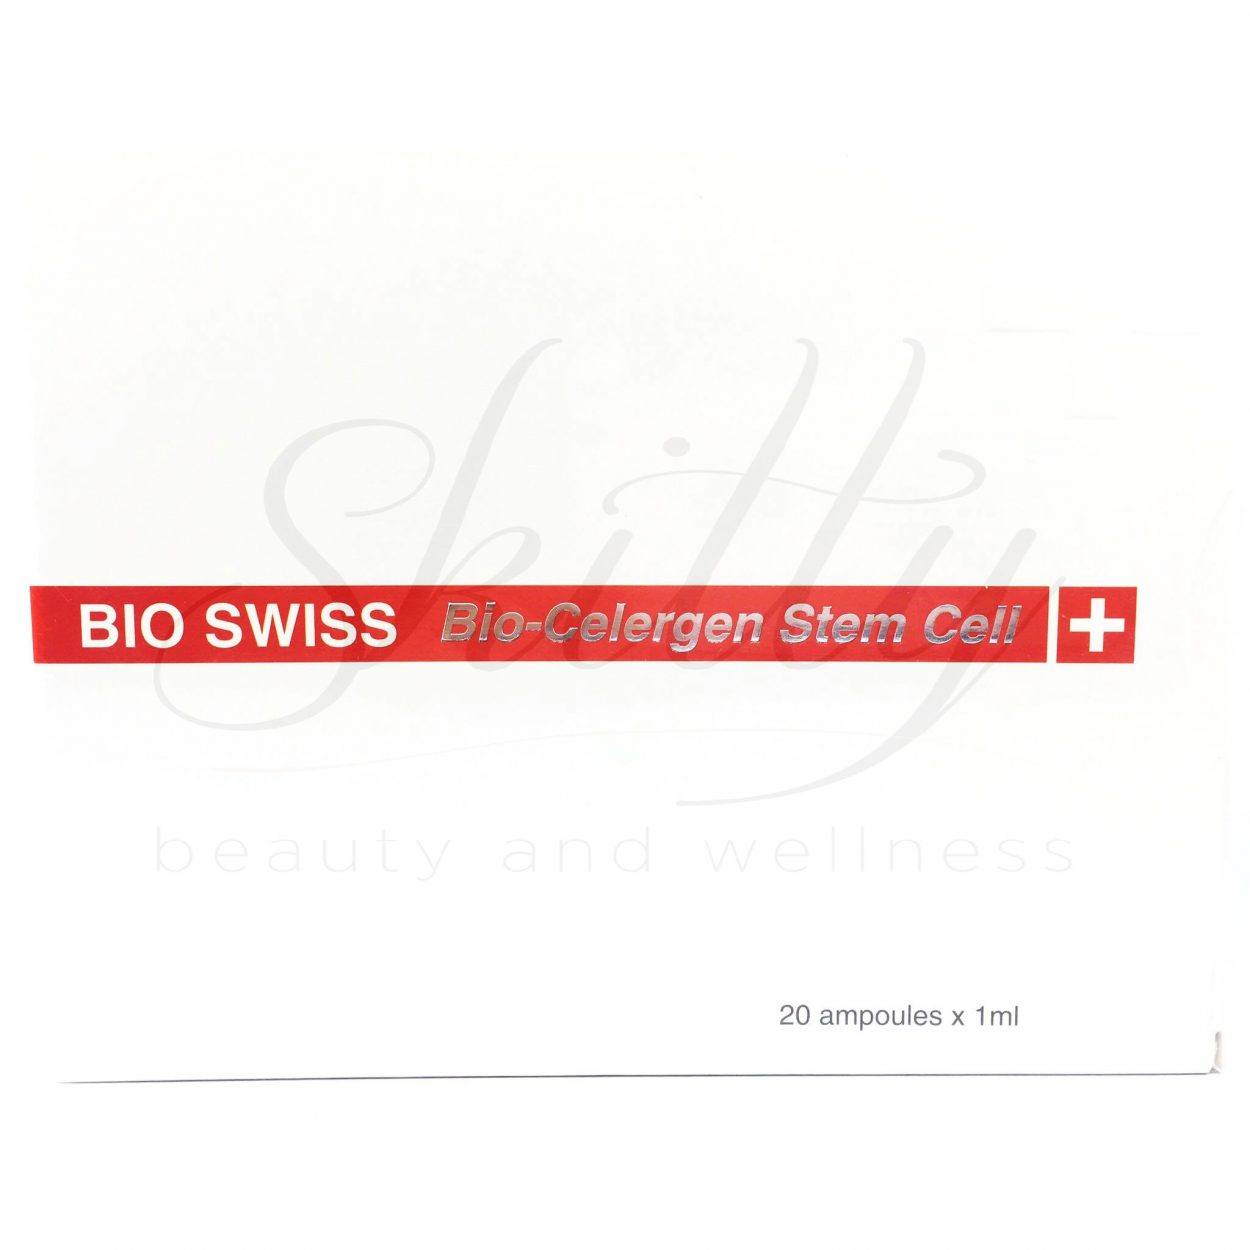 Bio Swiss Stemcell